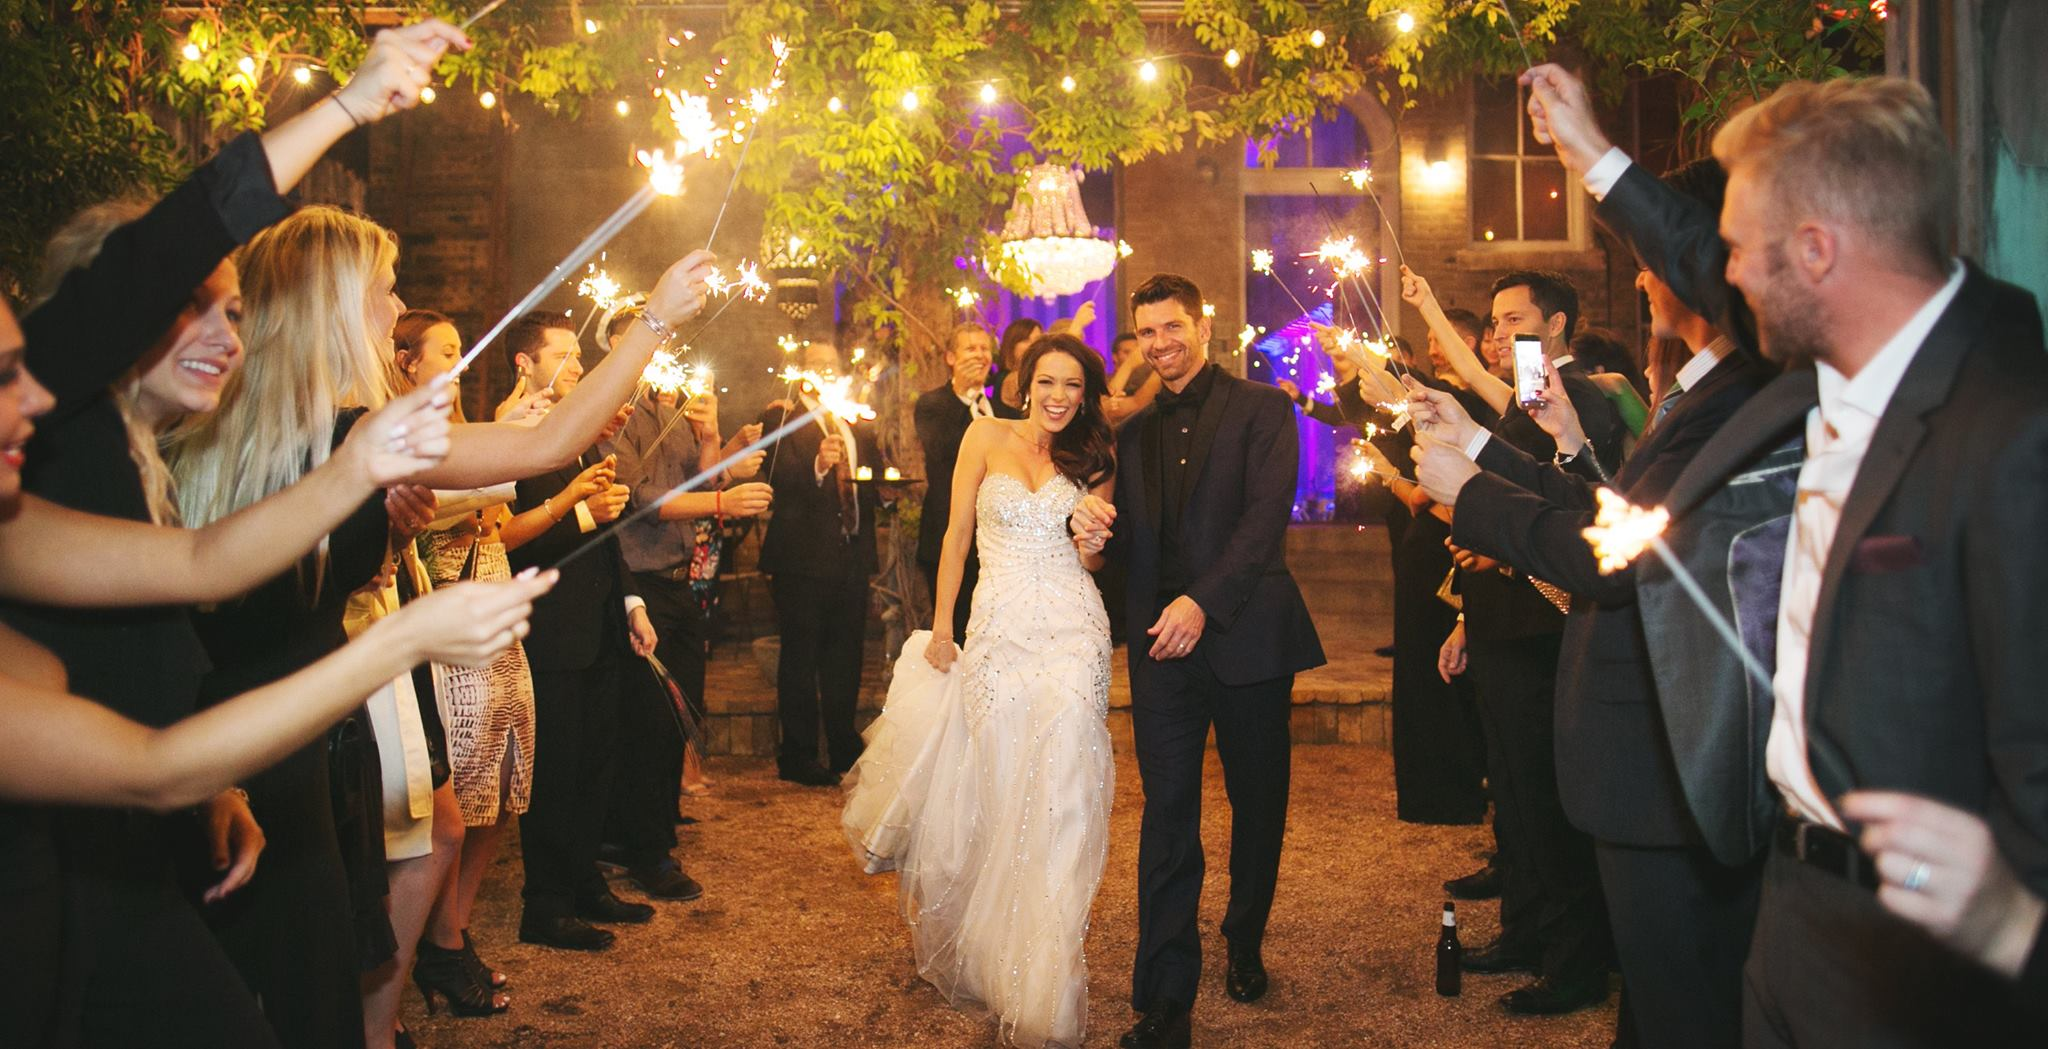 Thoreson Wedding3.jpg